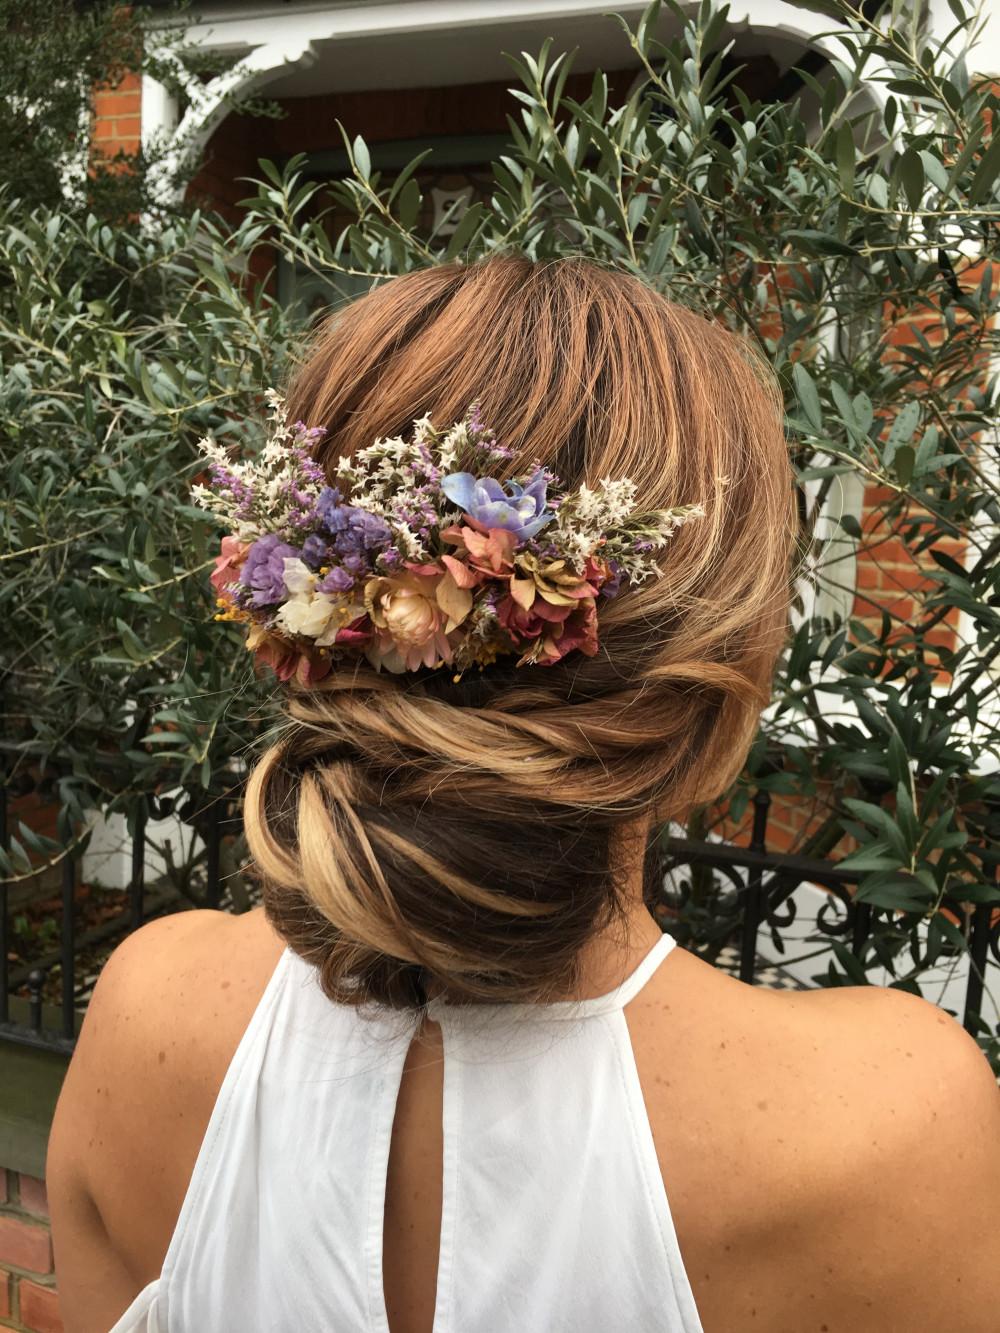 - Make Me Bridal Artist: Rosie Hart . #bridalhair #flowersinherhair #lowbun #natural #bohobride #texturedupdo #hairup #hairupideas #flowercomb